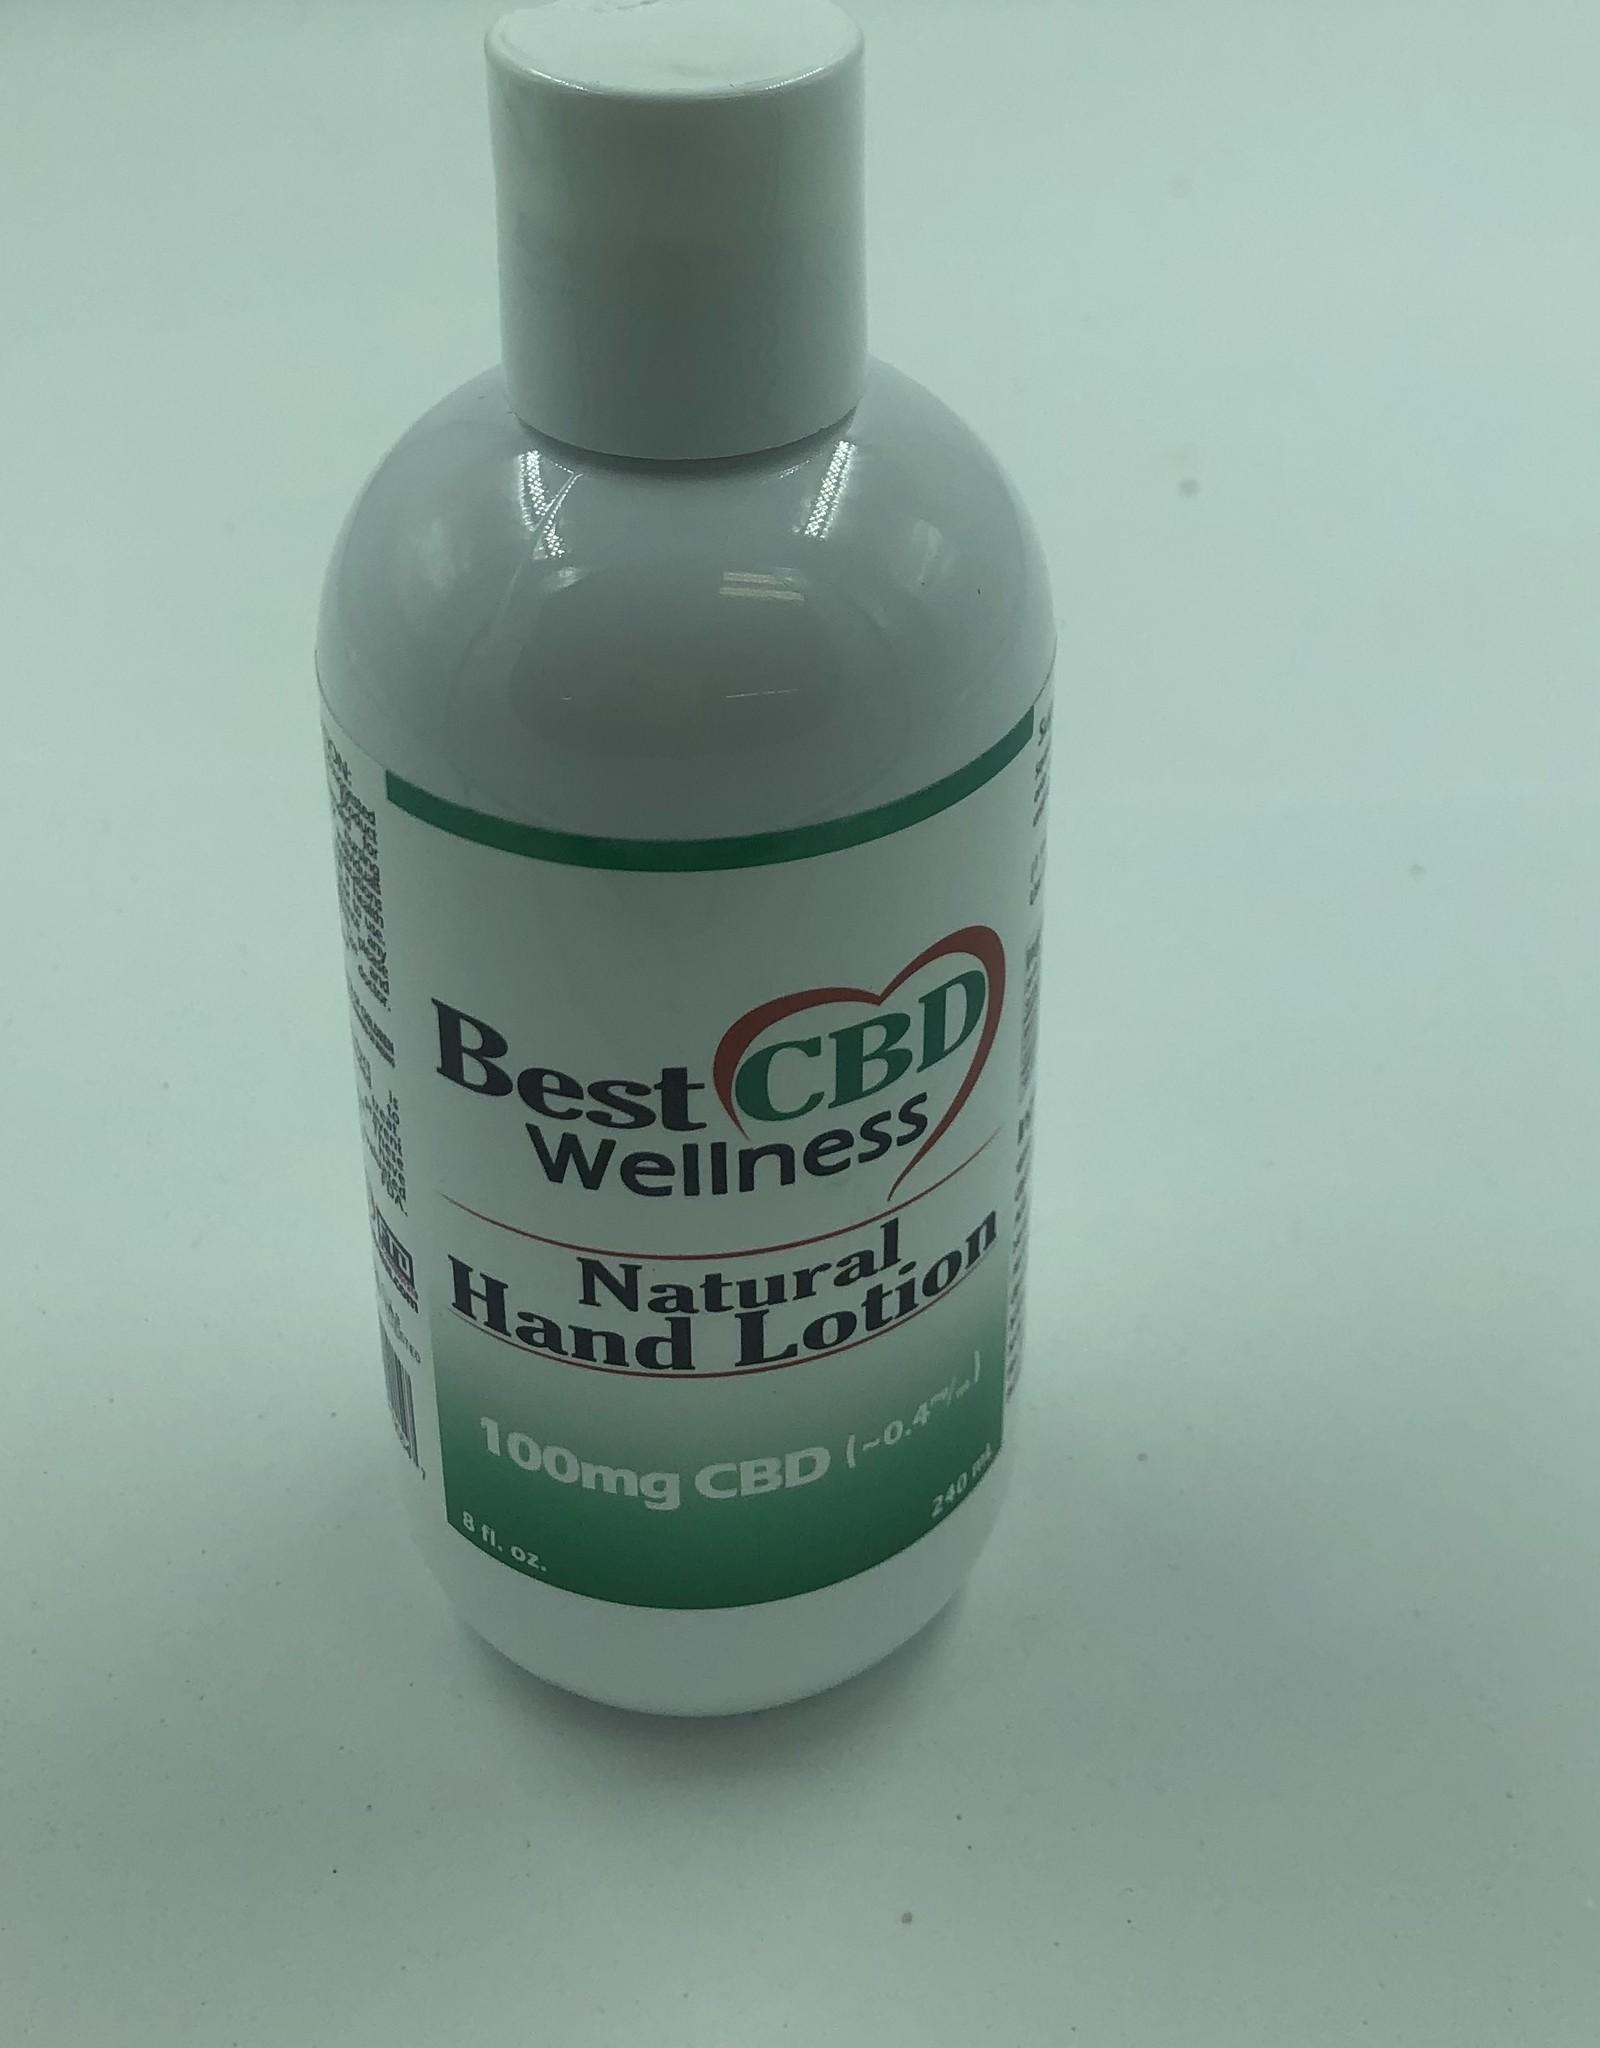 Best CBD Wellness CBD Natural Hand Lotion 100mg, 8oz, 240mL